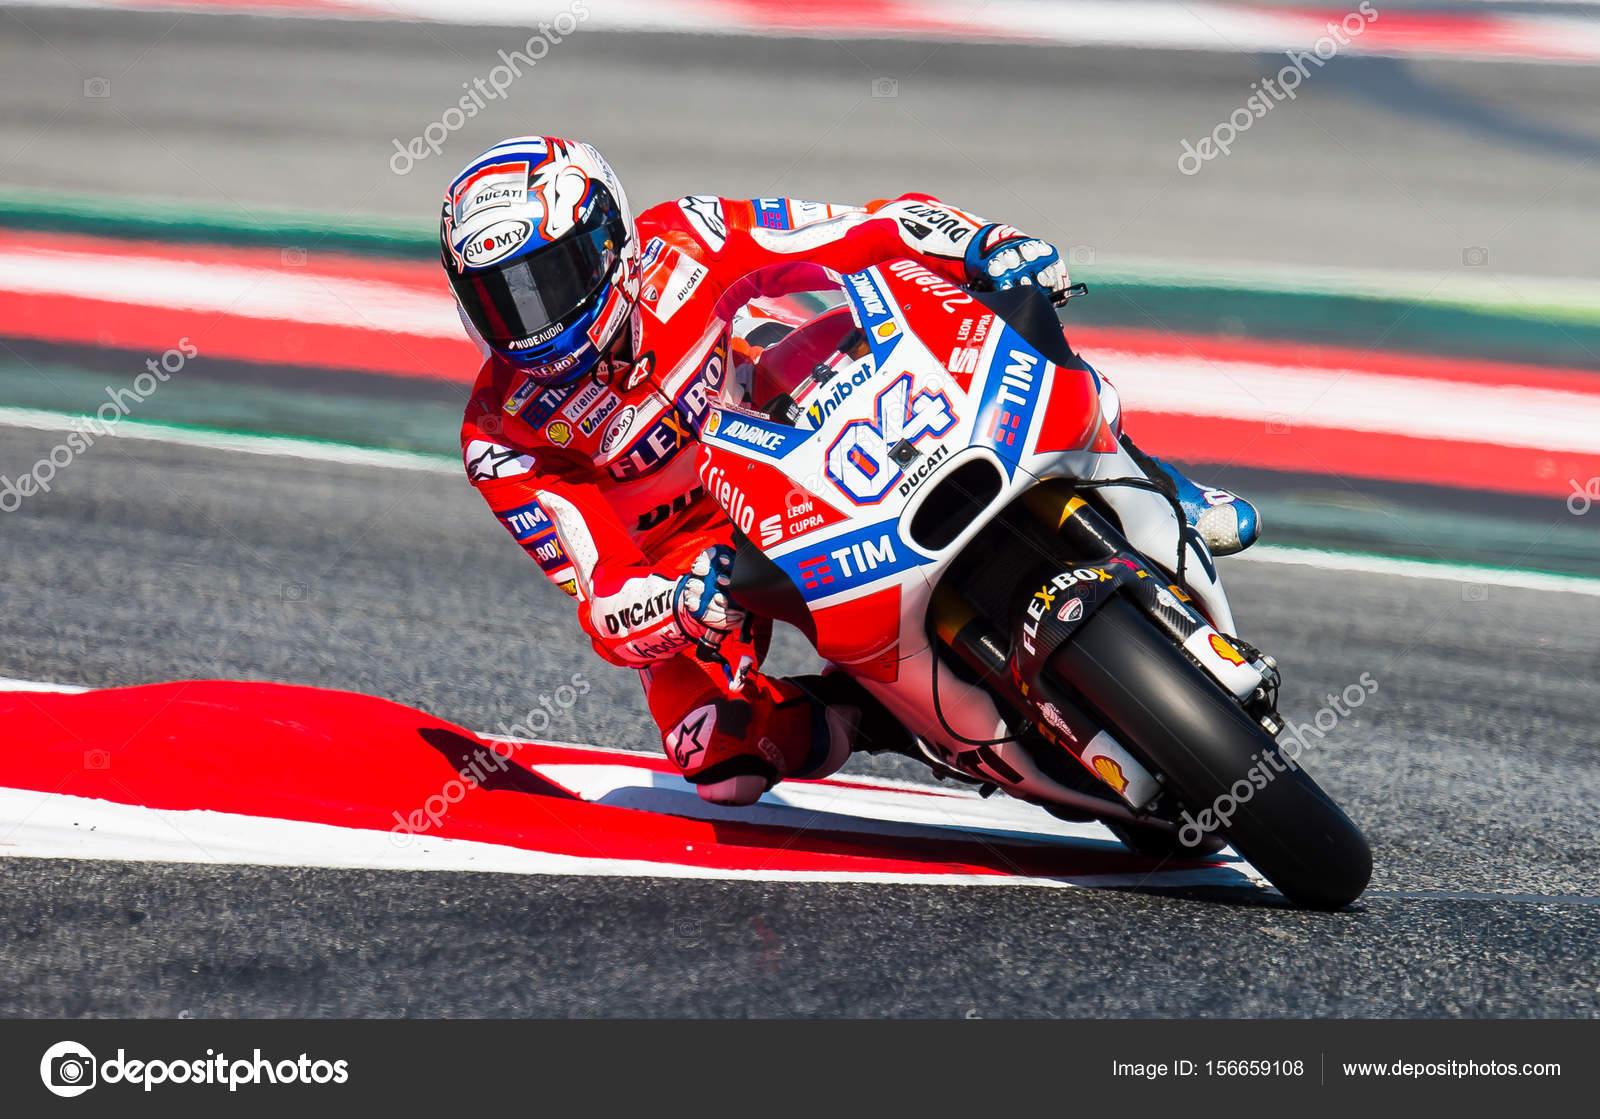 Gp Catalunya Moto Gp Andrea Dovizioso Stokovoe Redakcionnoe Foto